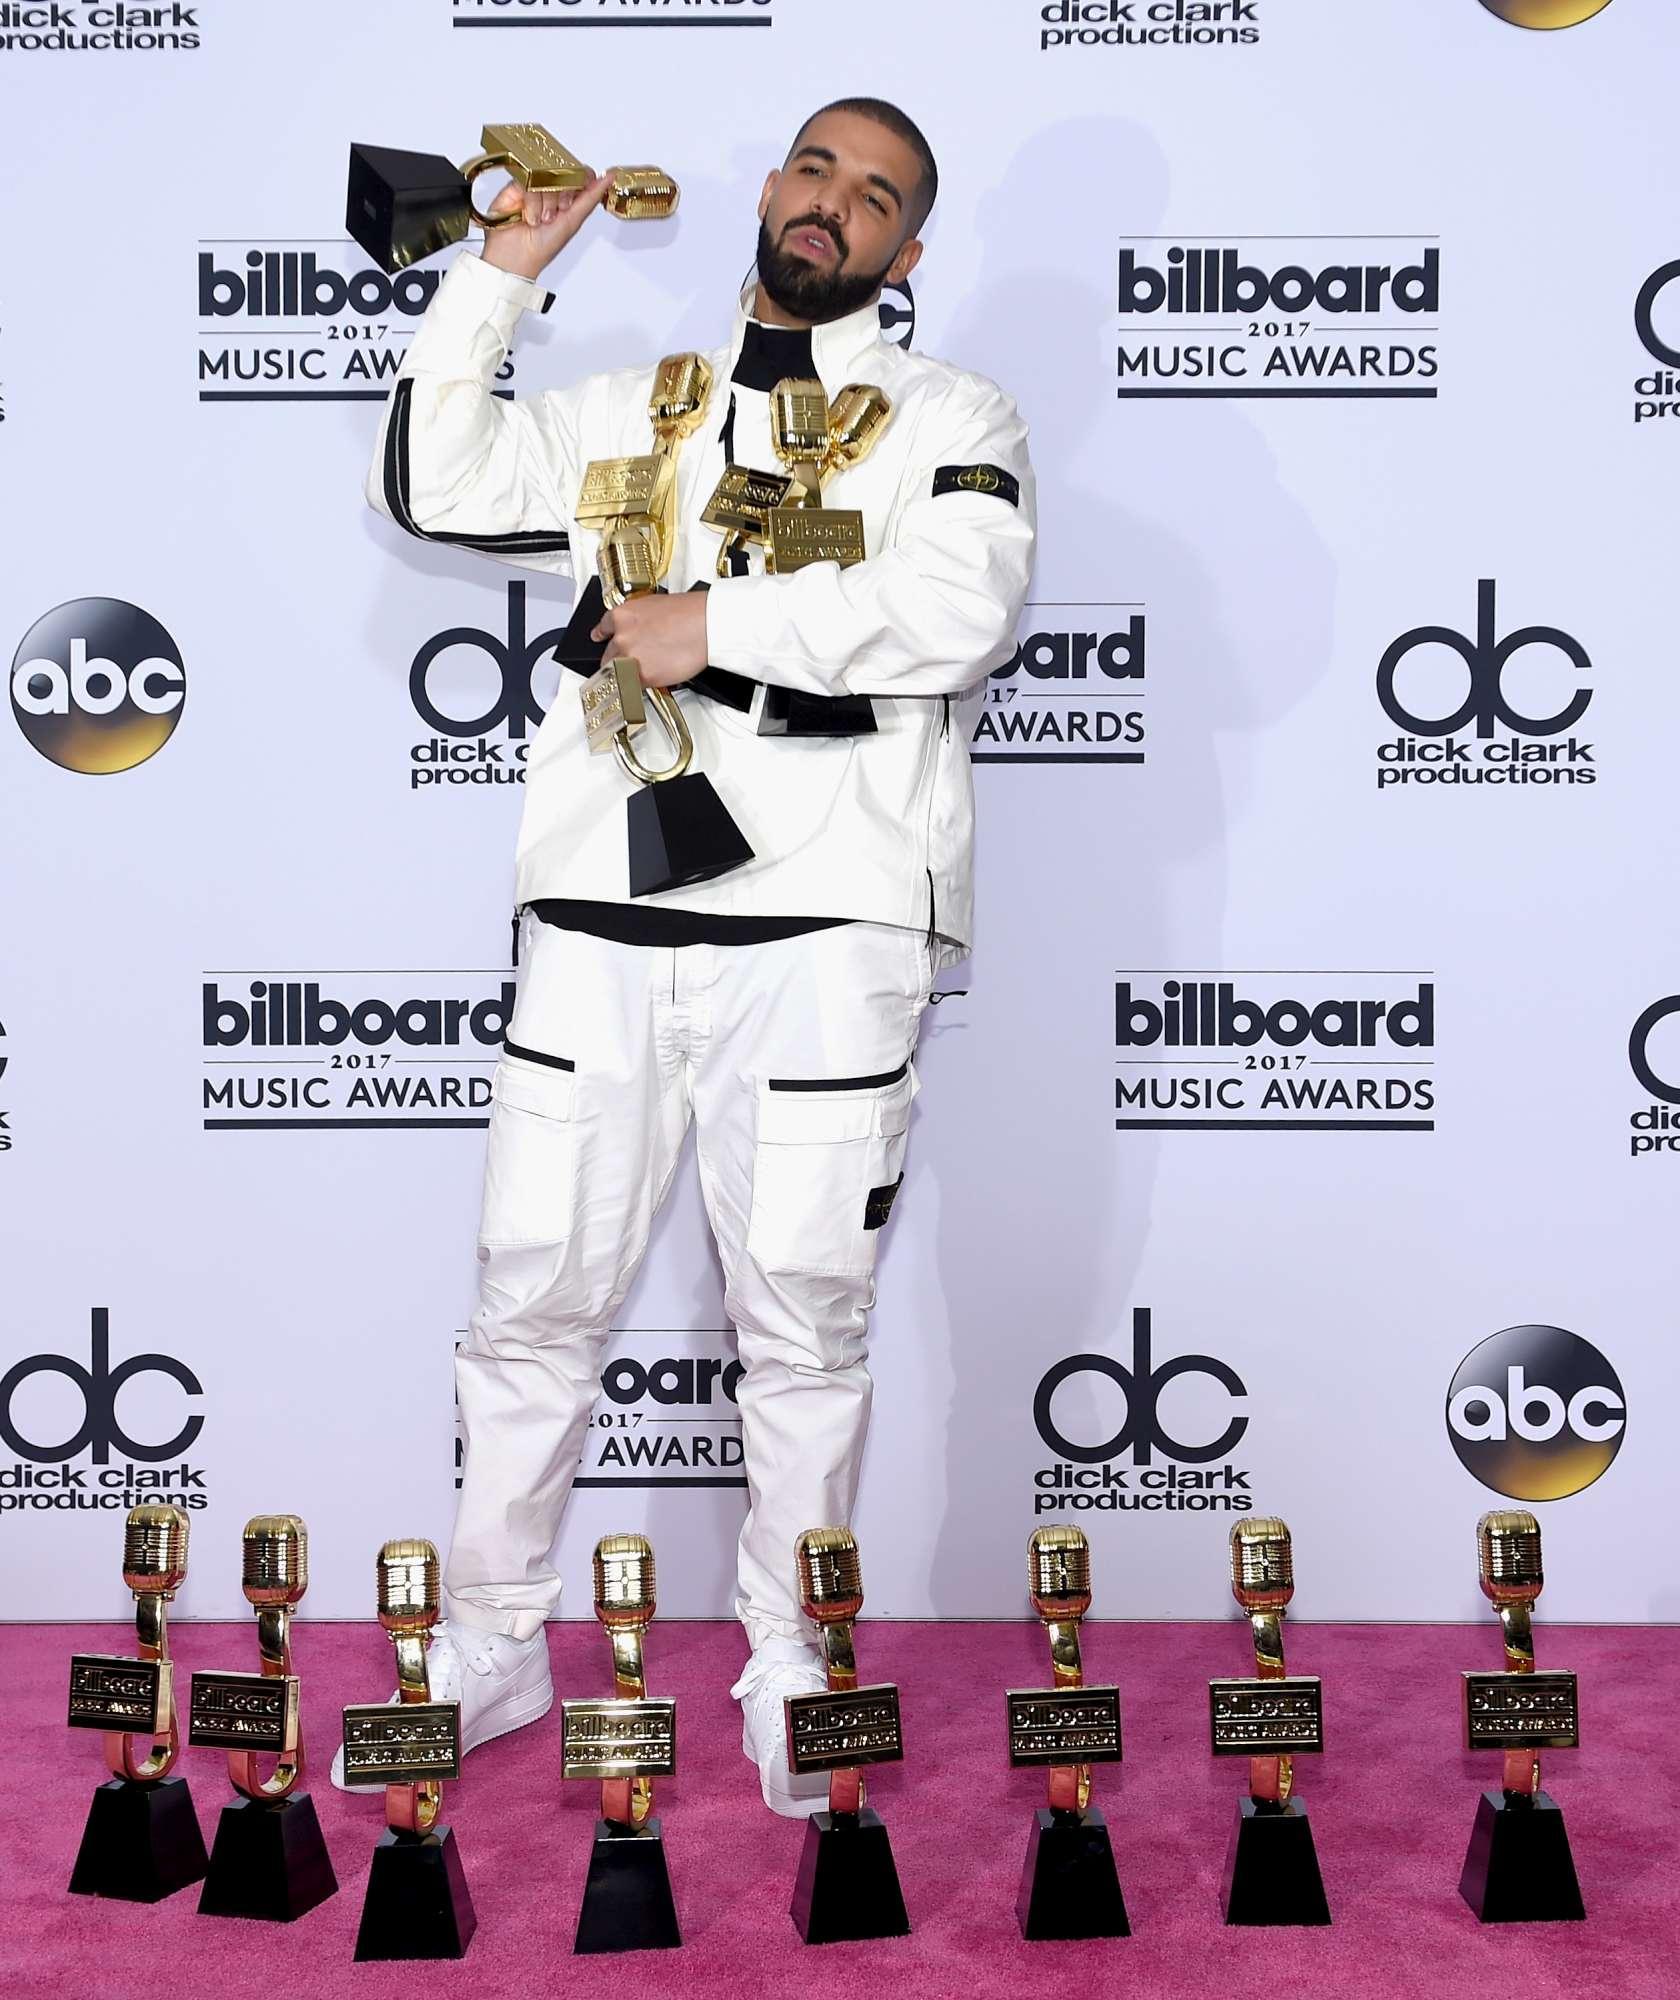 Billboard 2017, Drake superstar, Nicki Minaj in twerking e gli altri...